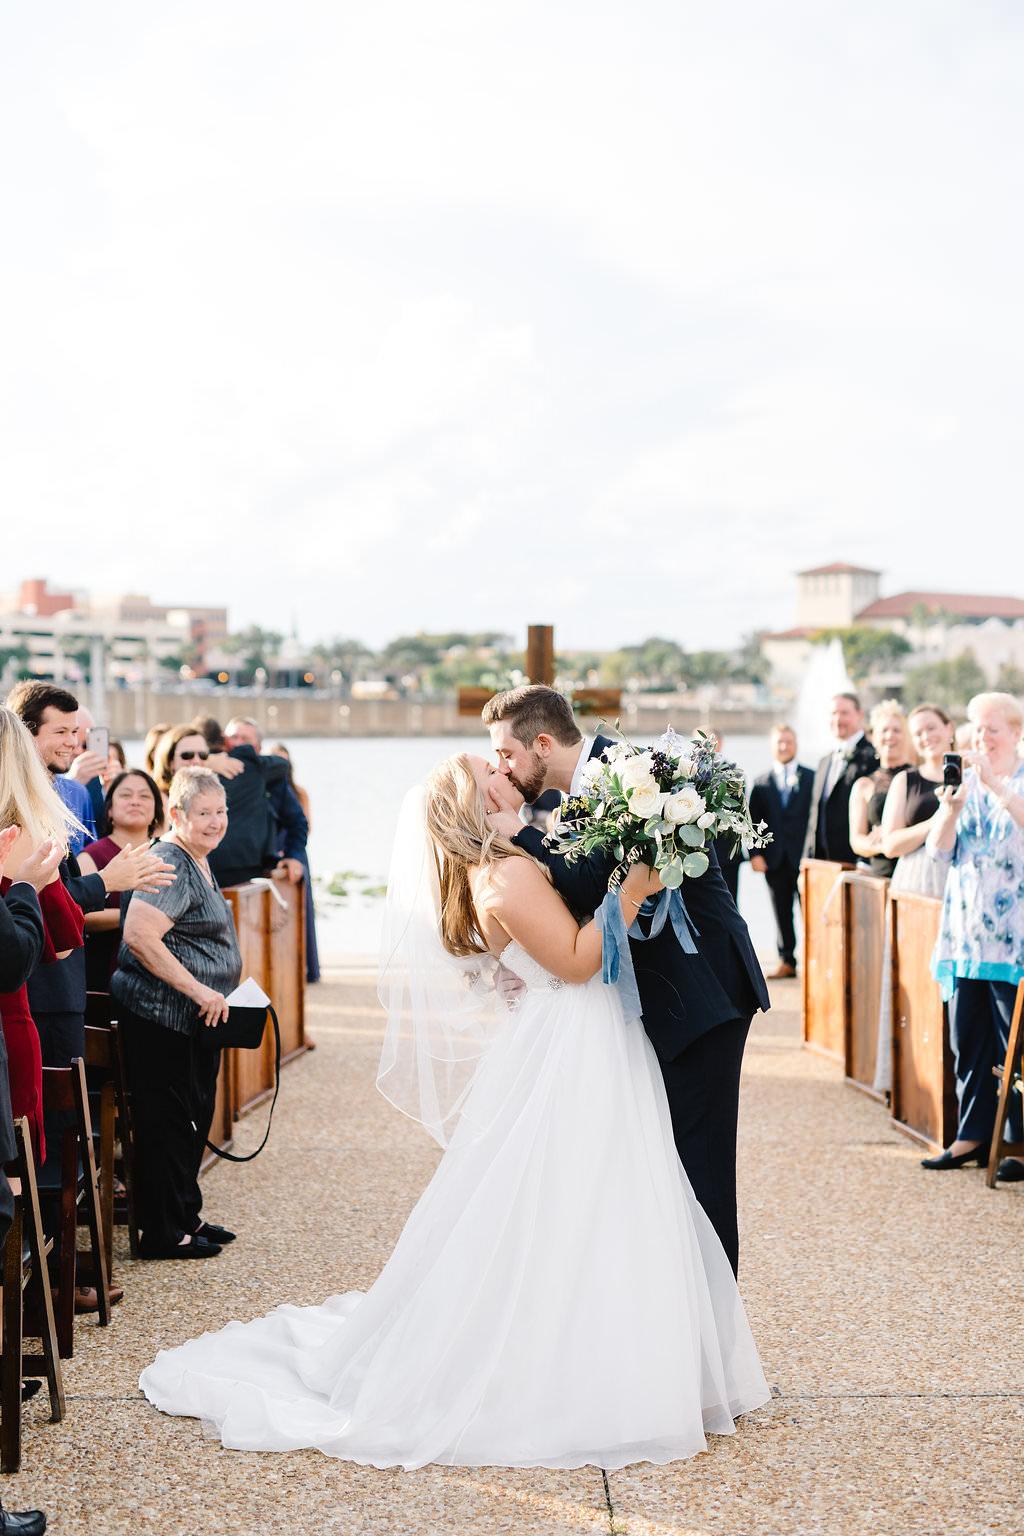 Florida Bride and Groom Wedding Ceremony Exit Wedding Portrait   Lakeland Wedding Venue Lake Mirror Amphitheater   Tampa Wedding Planner Love Lee Lane